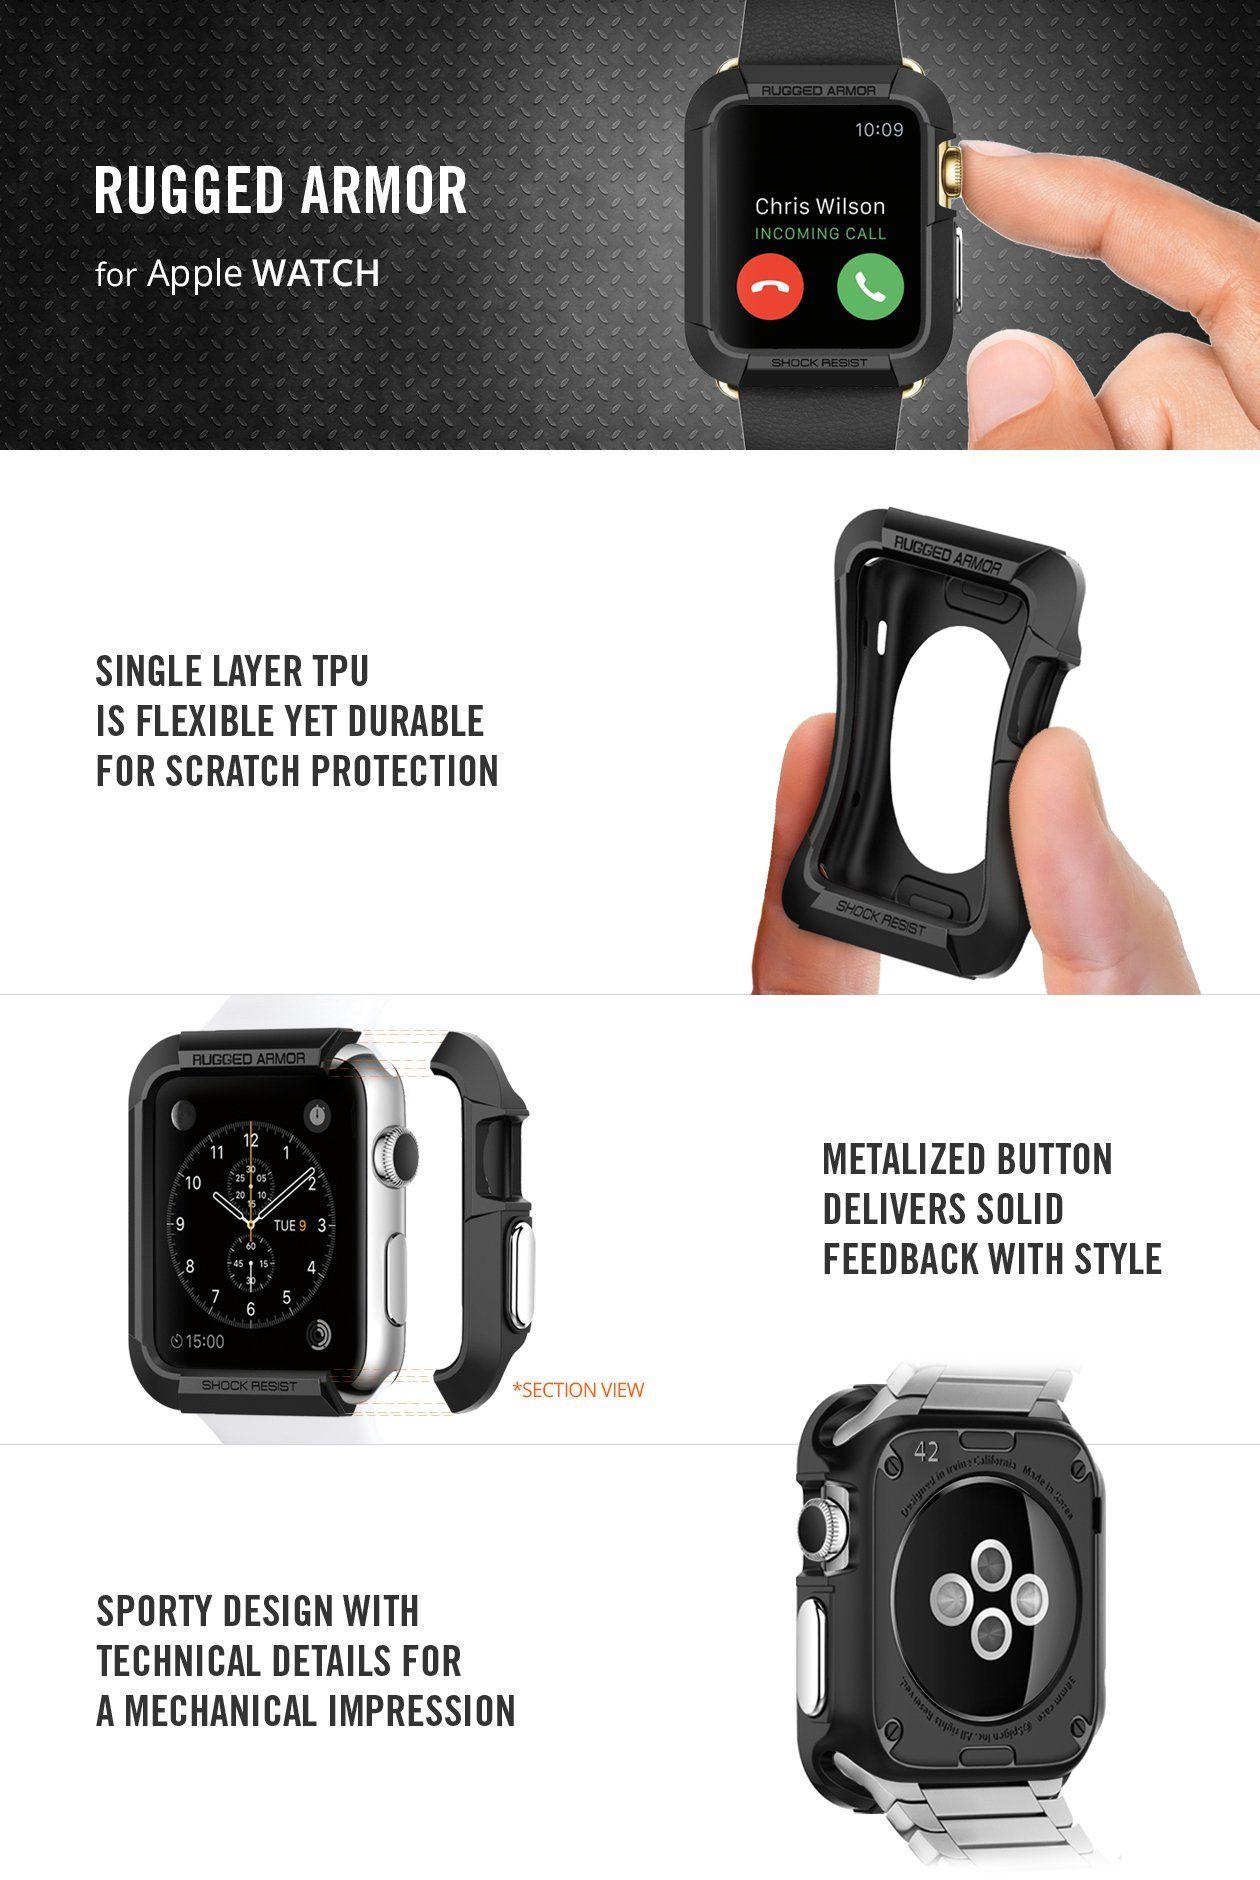 Apple Watch Series 3 2 1 42mm Case Rugged Armor Apple Watch Apple Watch Case Spigen Apple Watch